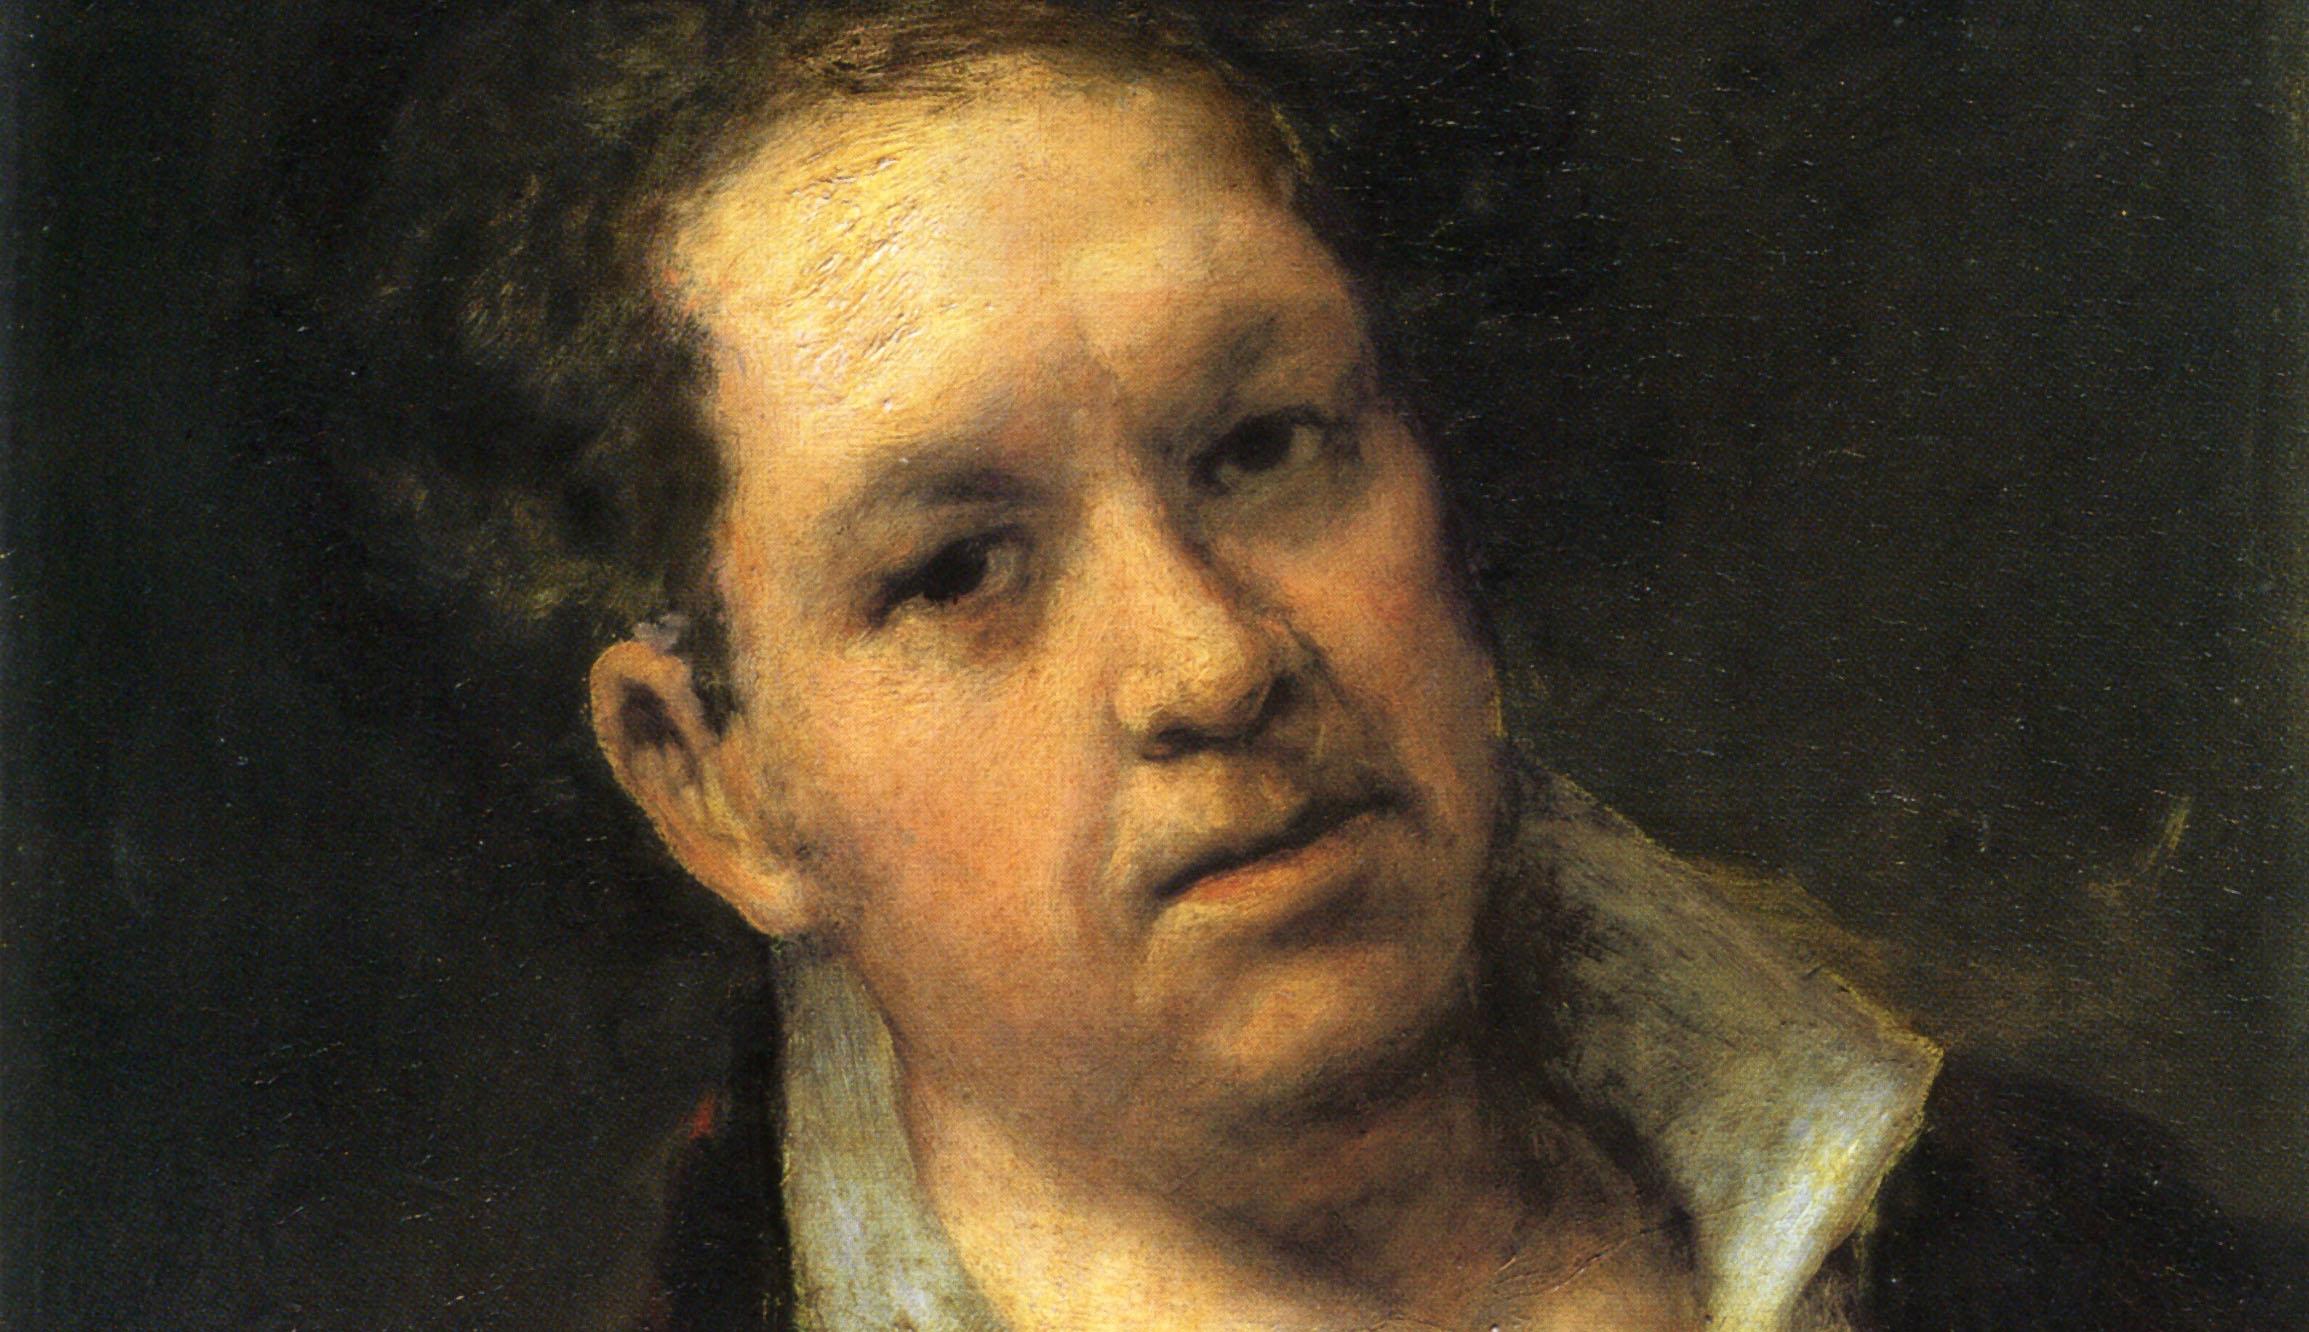 1746 - 1828: Francisco Goya, Painter (ES)